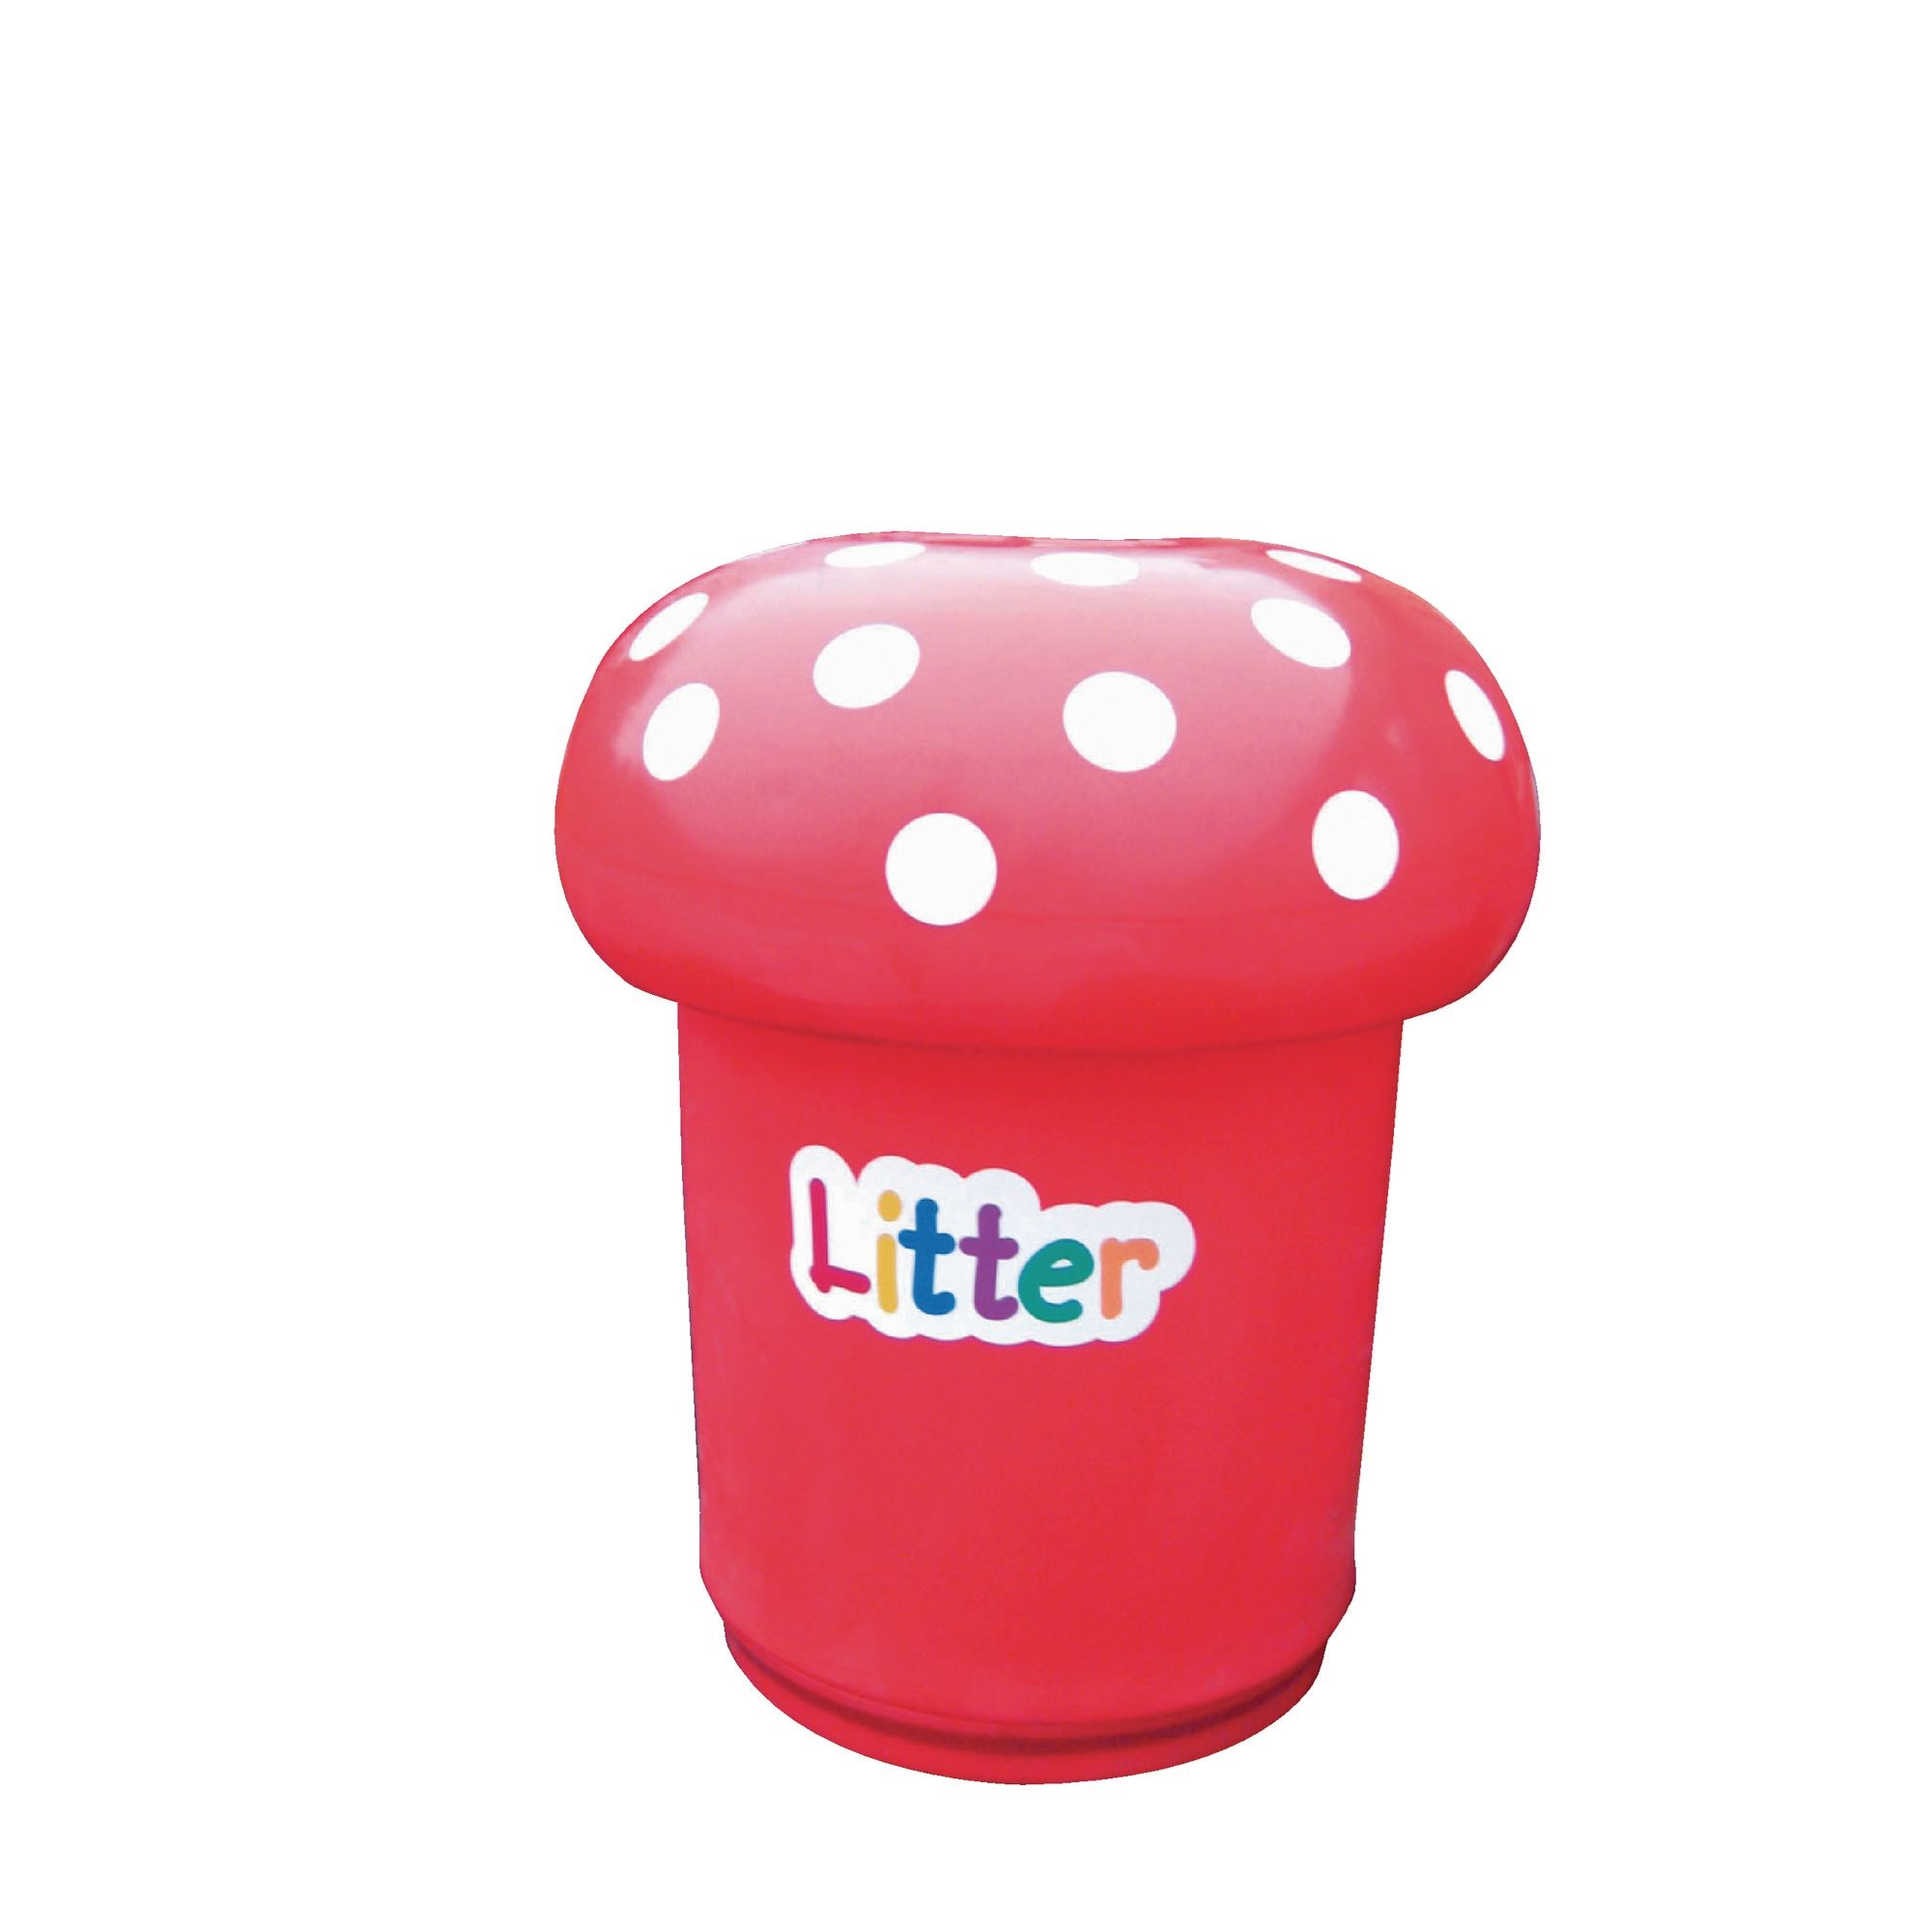 Mushroom Litter Bins Litter Label Red